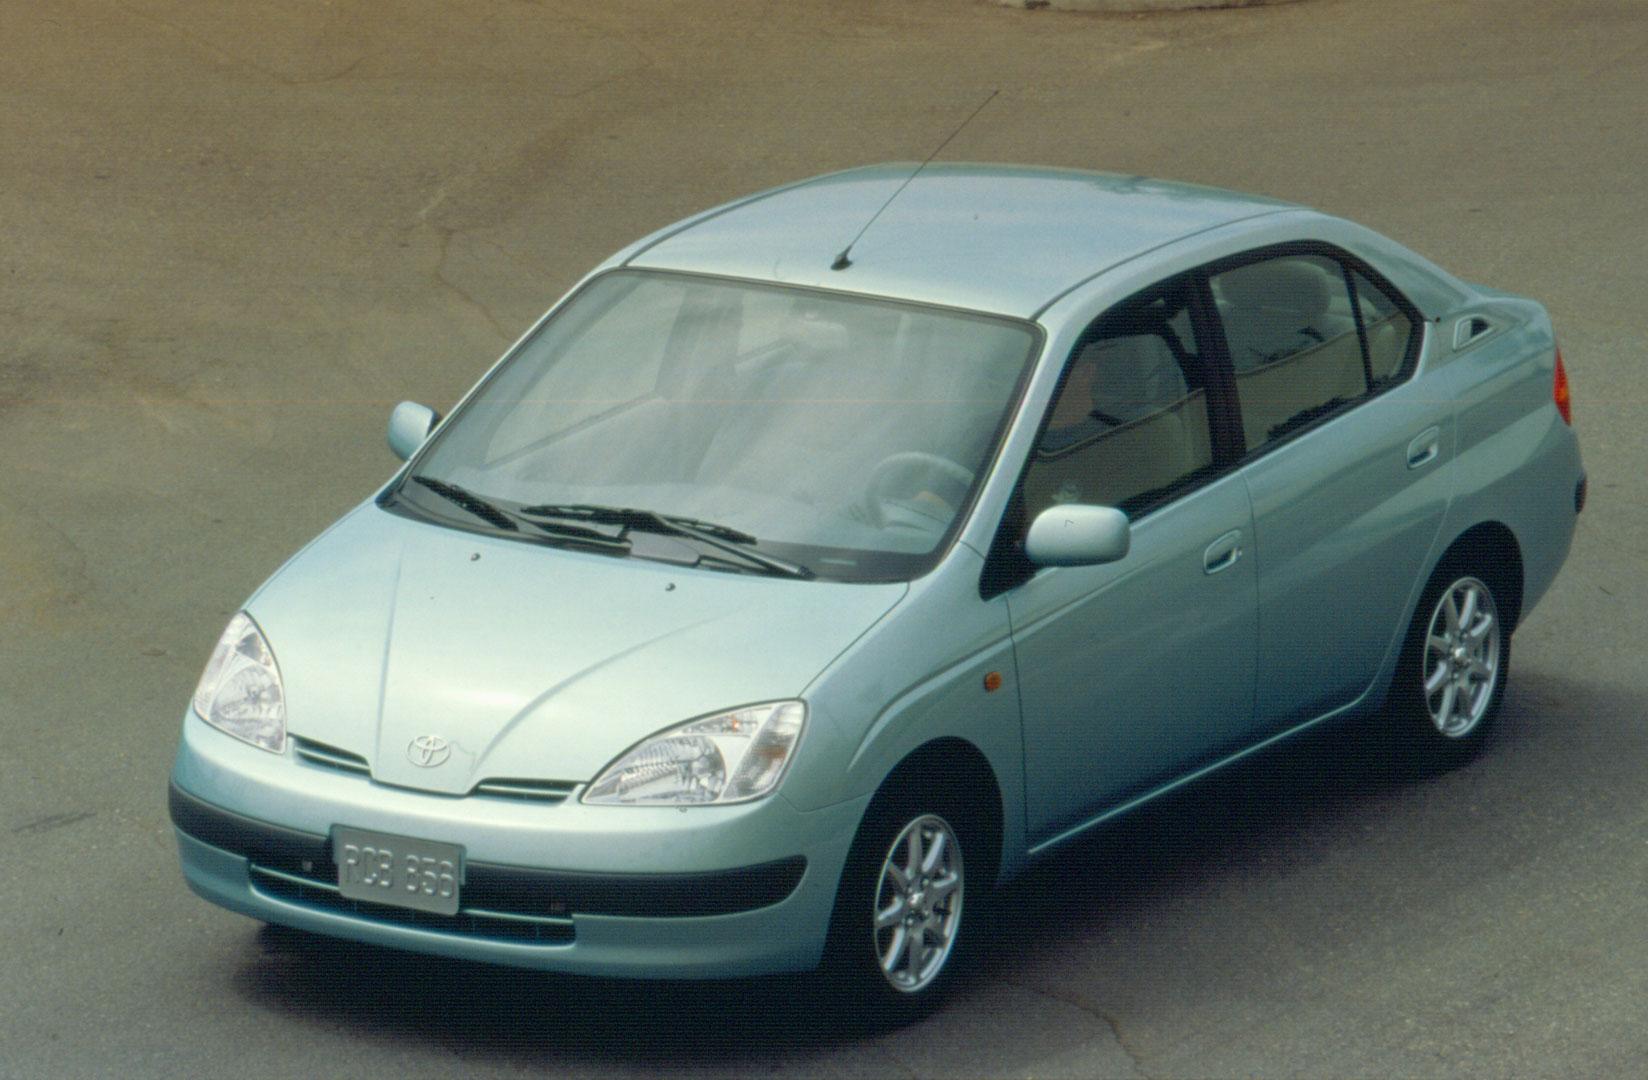 2000 Toyota Prius front 3/4